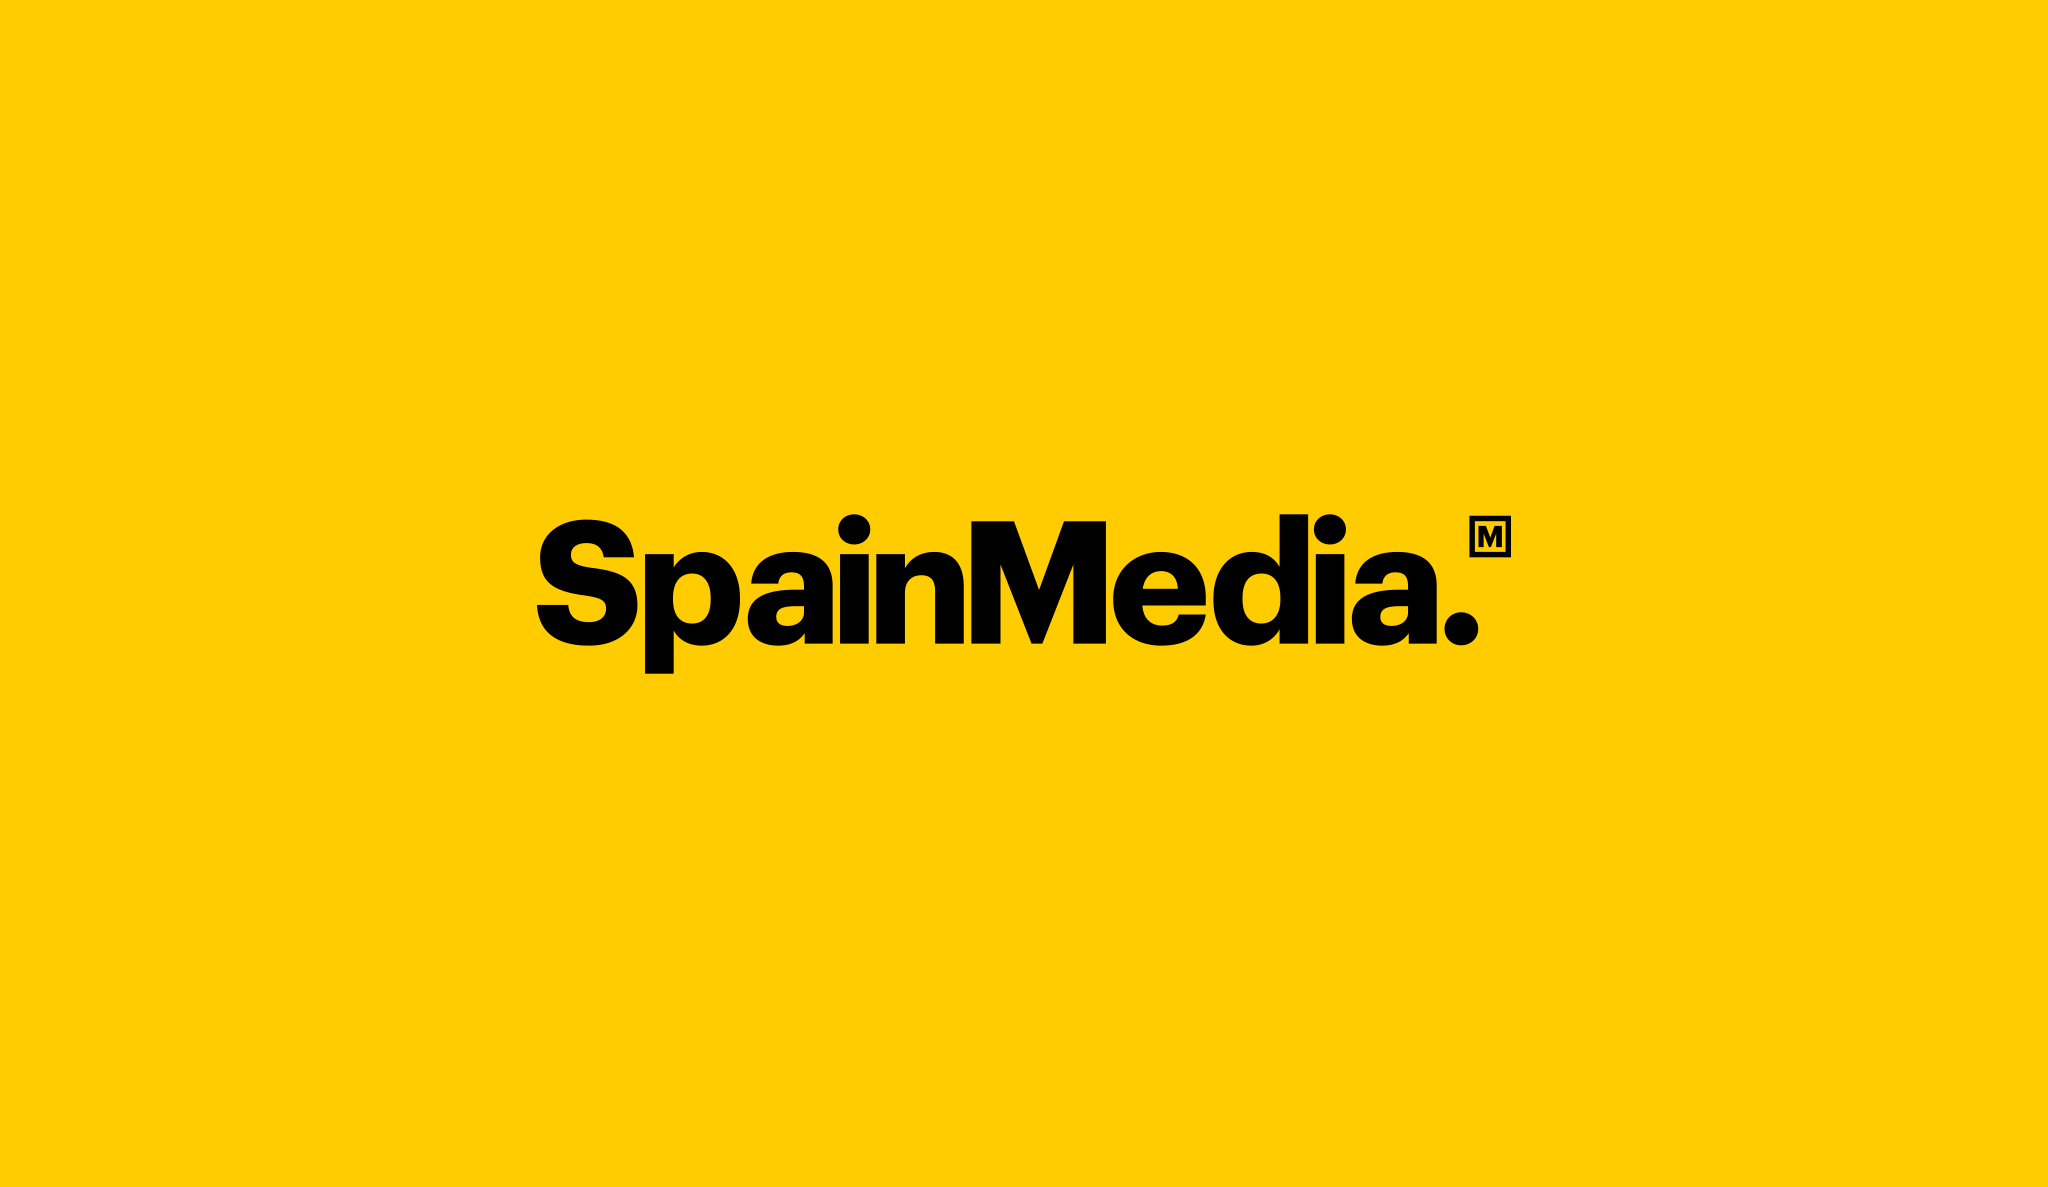 logo spainmedia